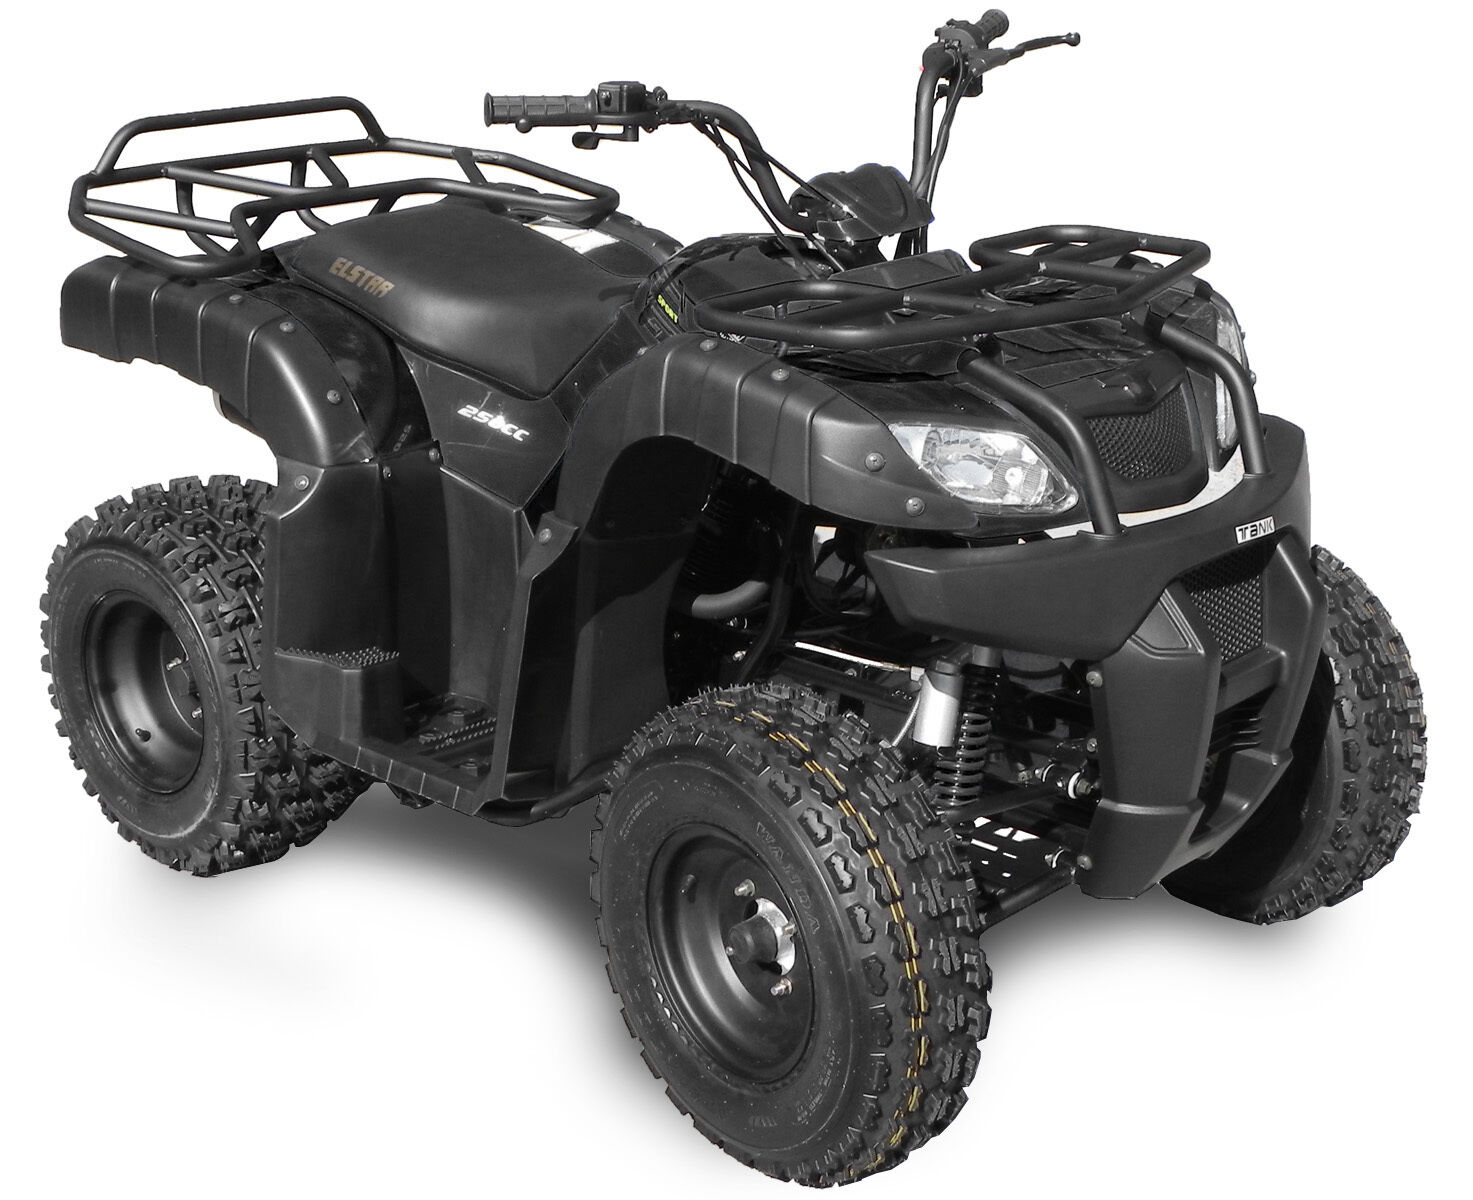 elstar tank eae250t 250cc manual farm atv quad bike icom ic-2350h manual